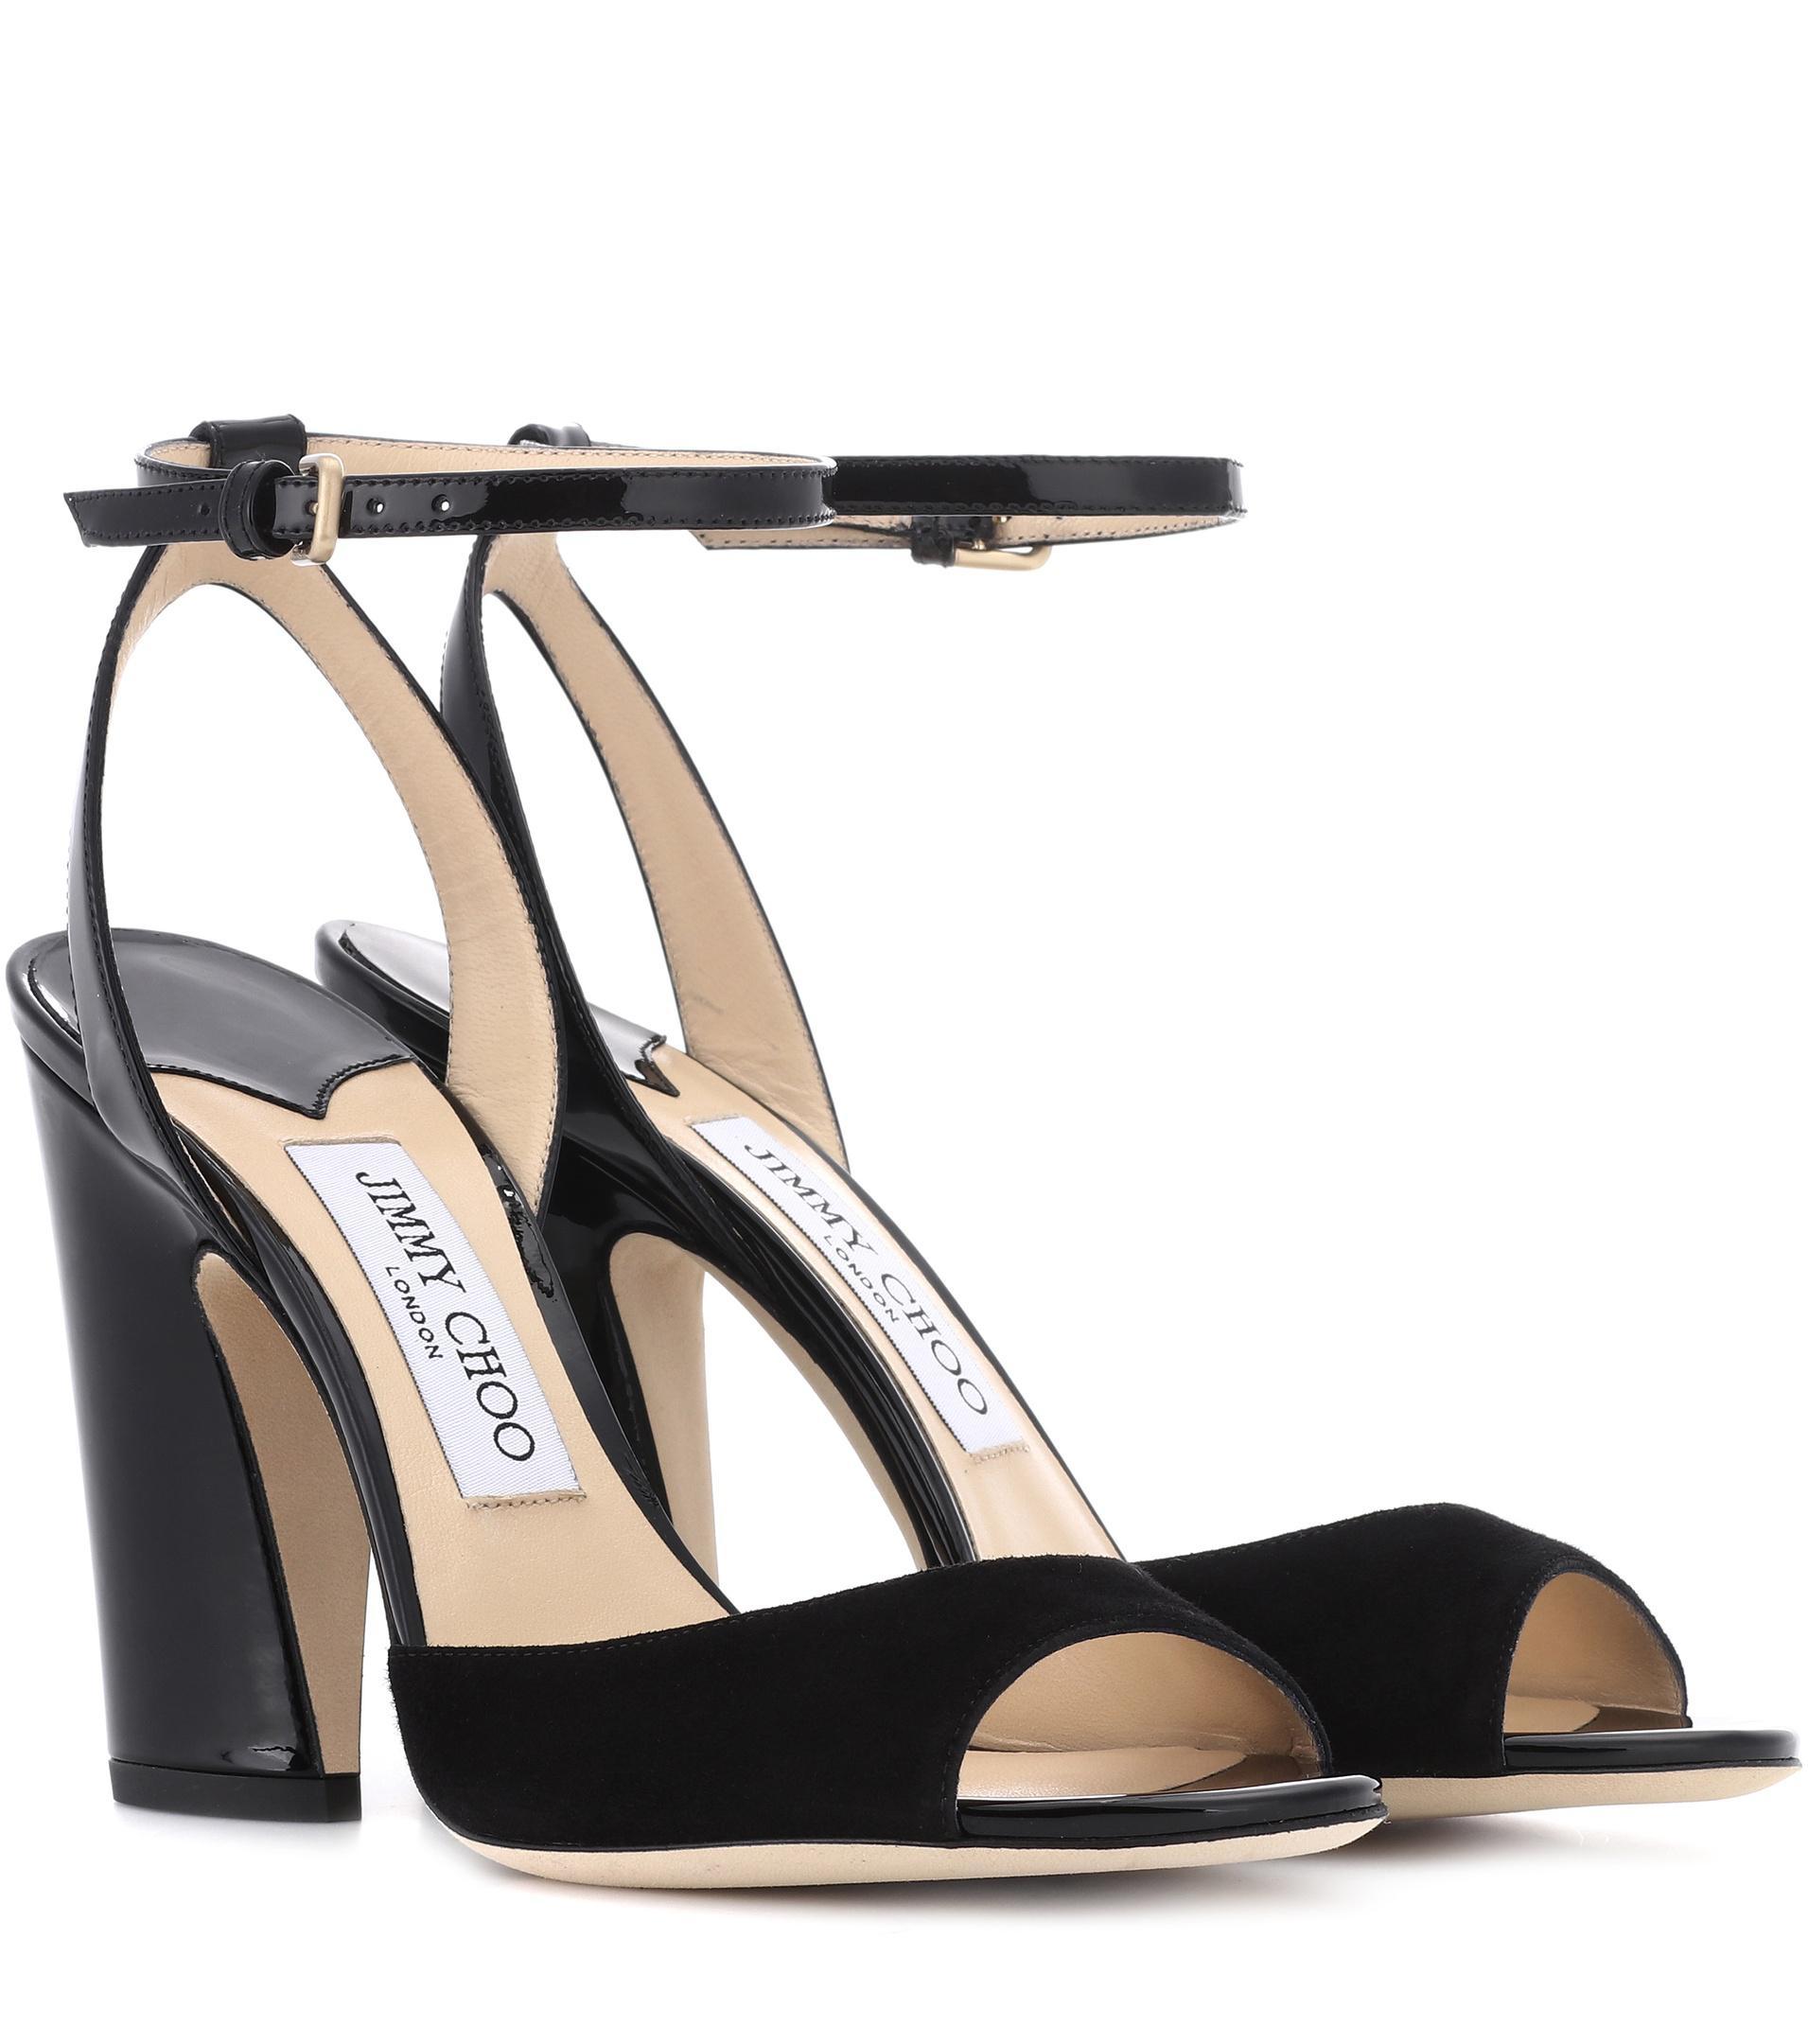 127175abb1e ... best price jimmy choo black miranda 100 suede sandals lyst. view  fullscreen 9b599 7a13a